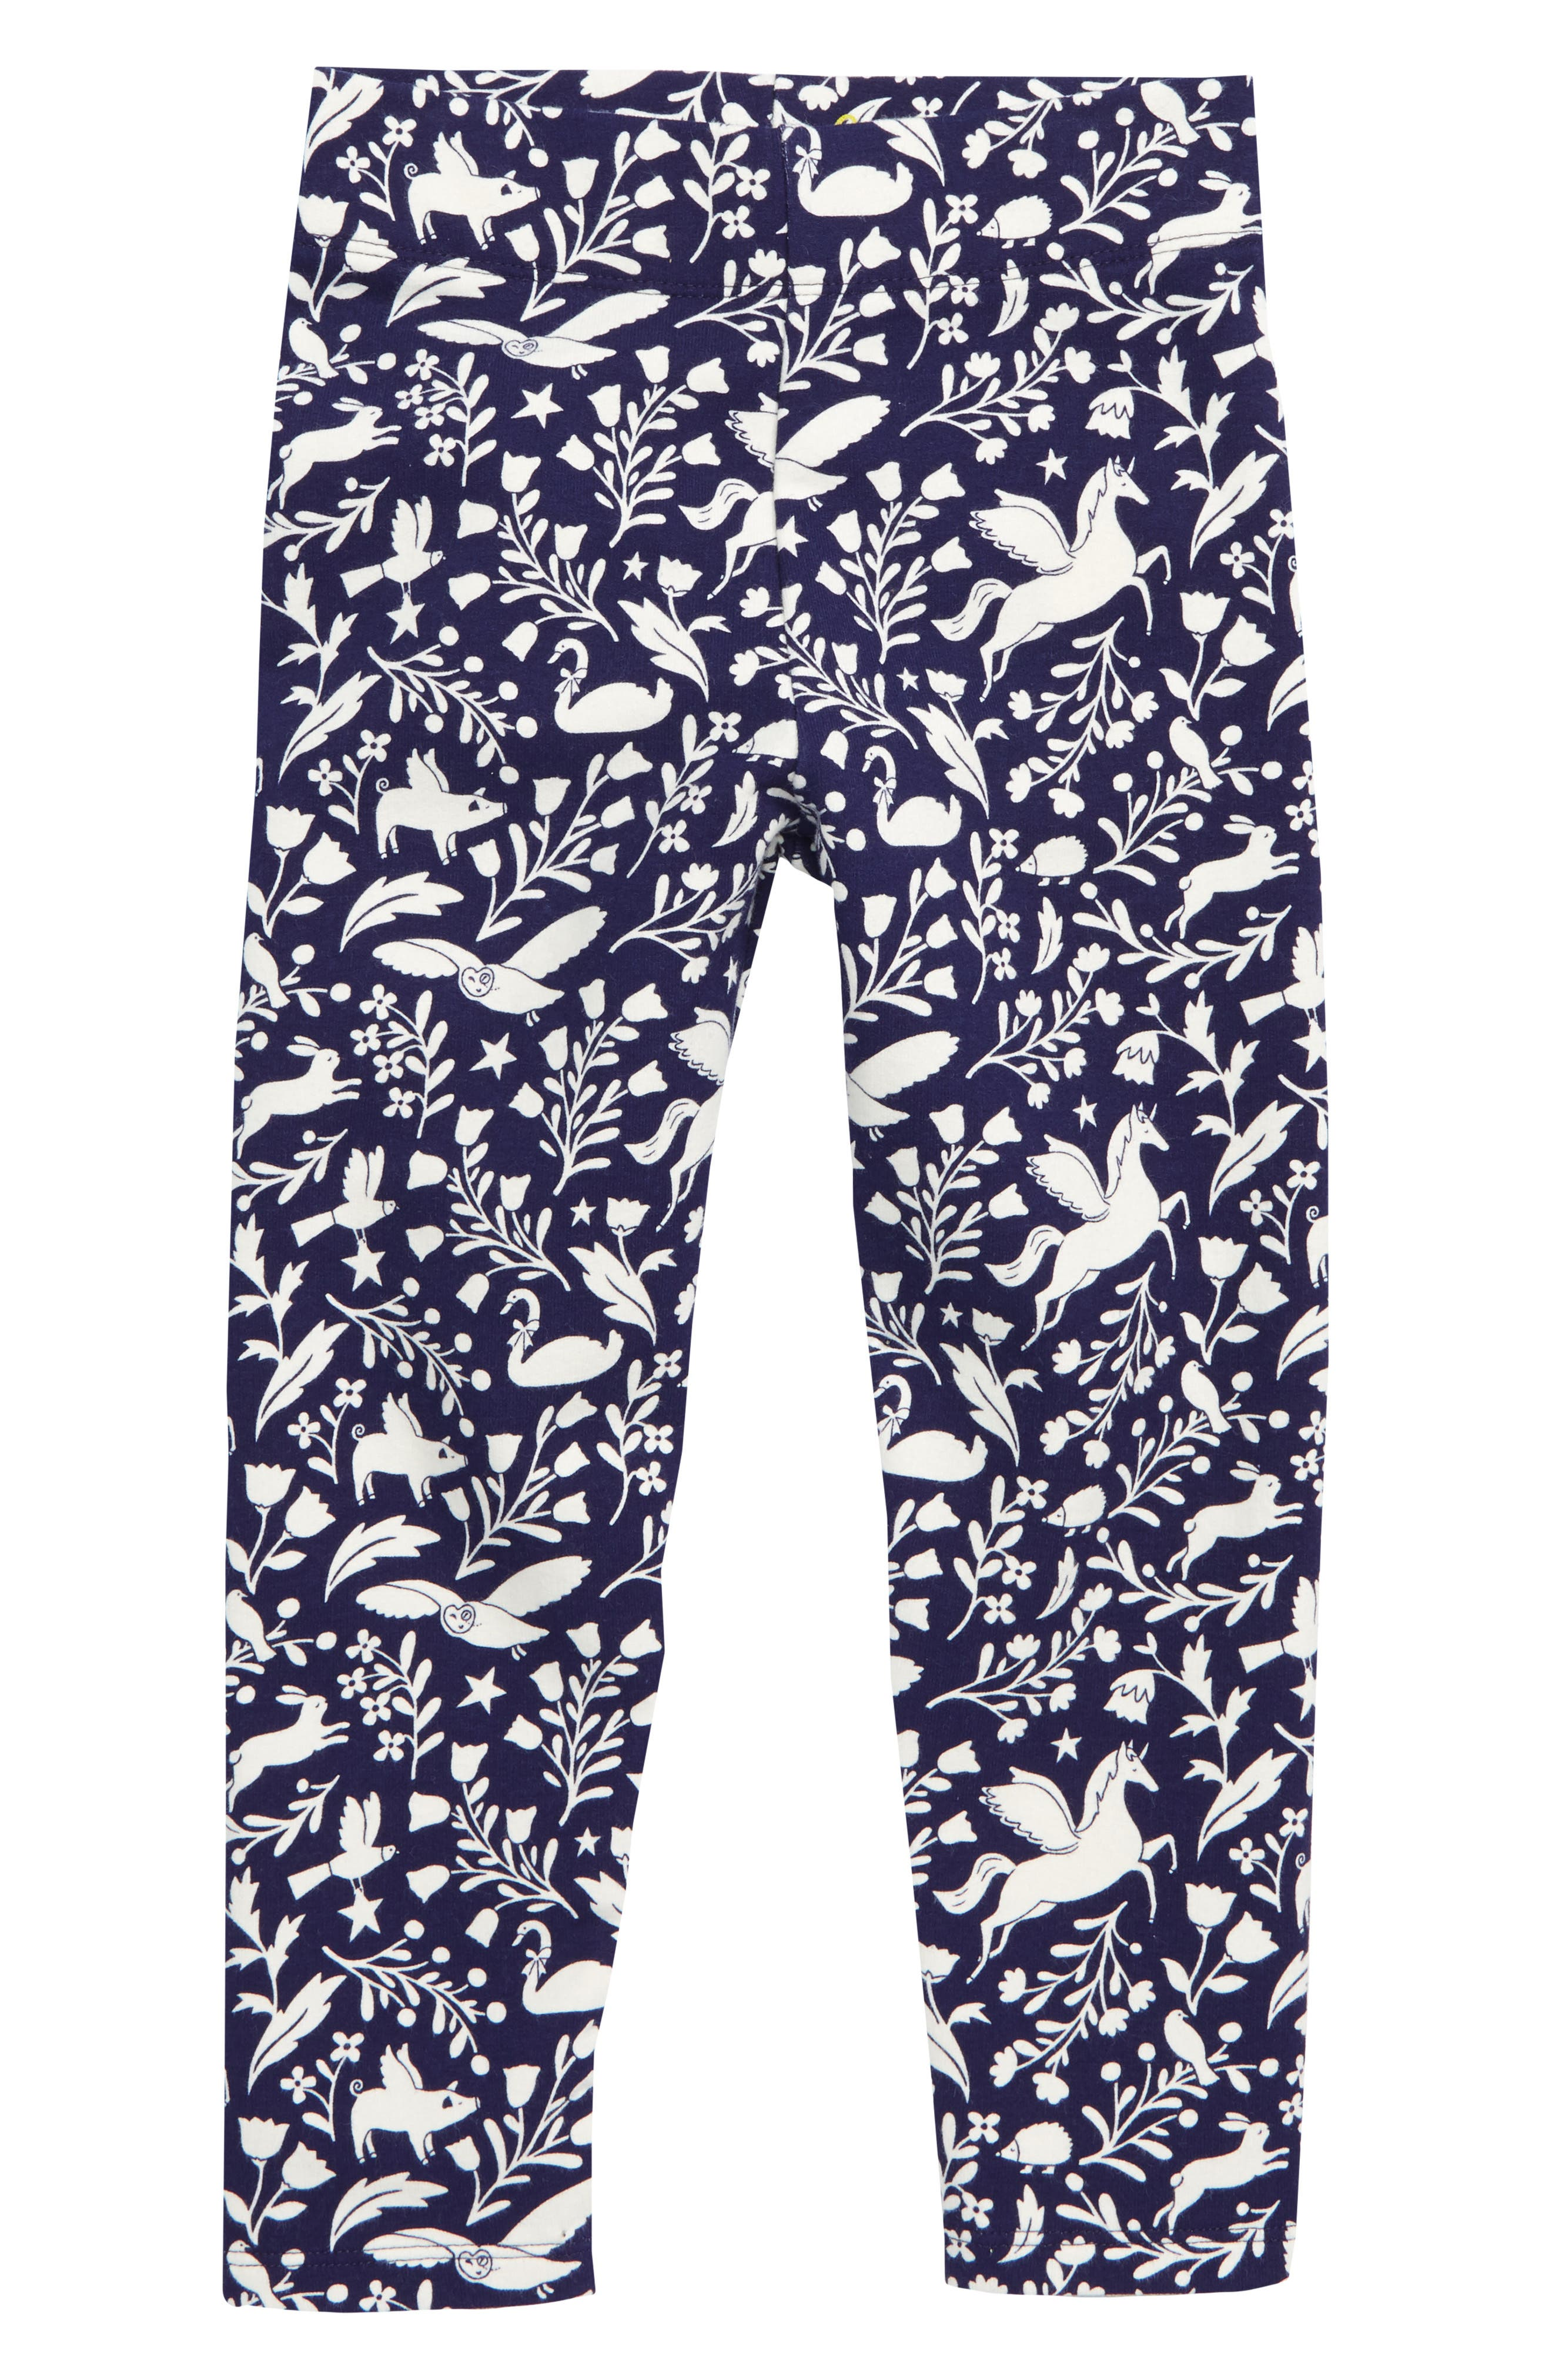 Toddler Girls Mini Boden Cosy Print Leggings Size 23Y  Blue